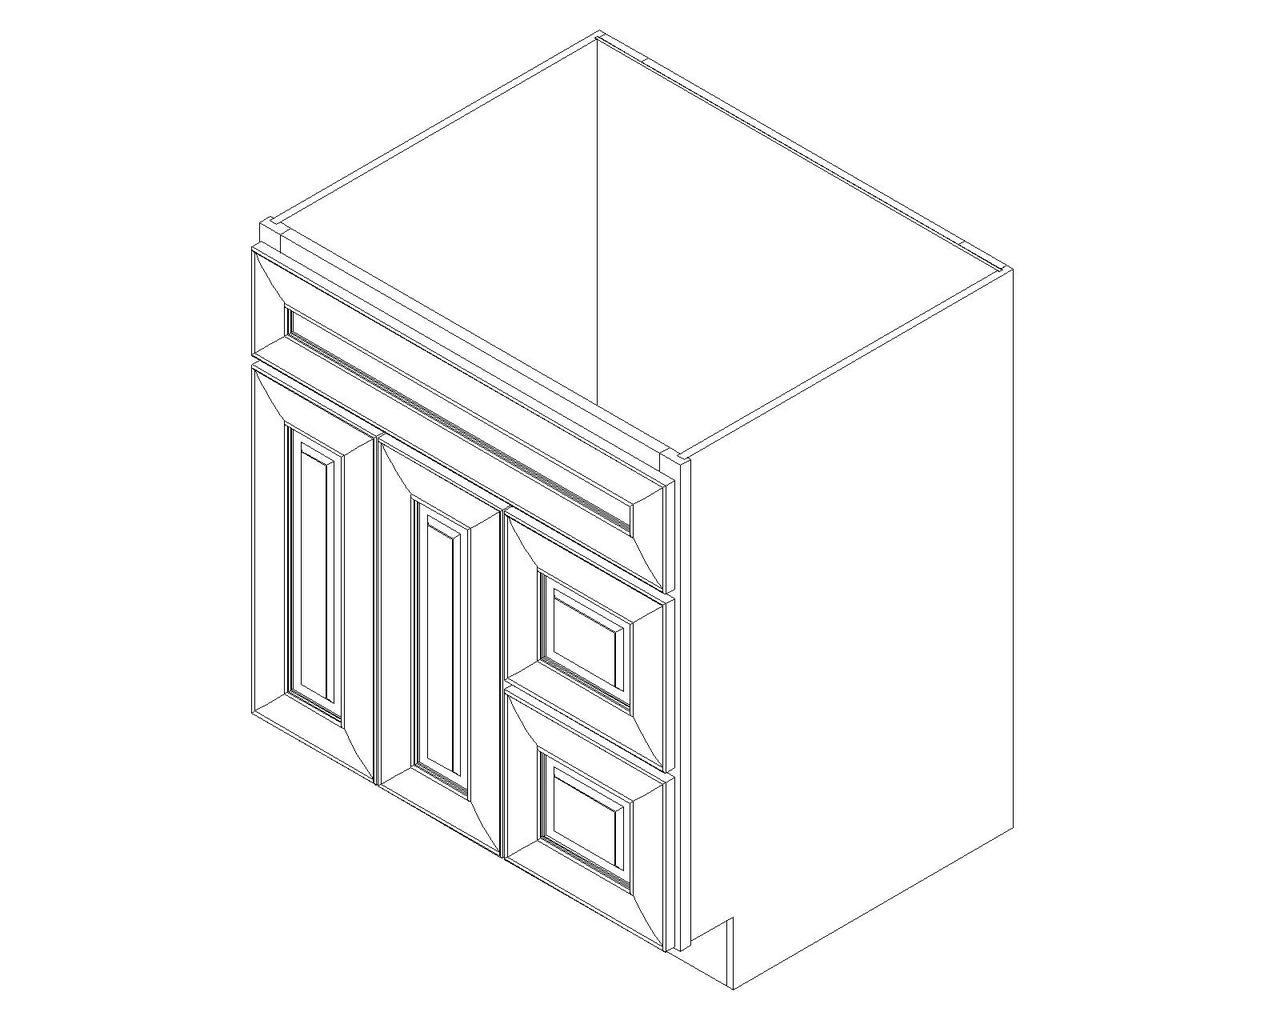 42 Bathroom Vanity Cabinets. Image Result For 42 Bathroom Vanity Cabinets